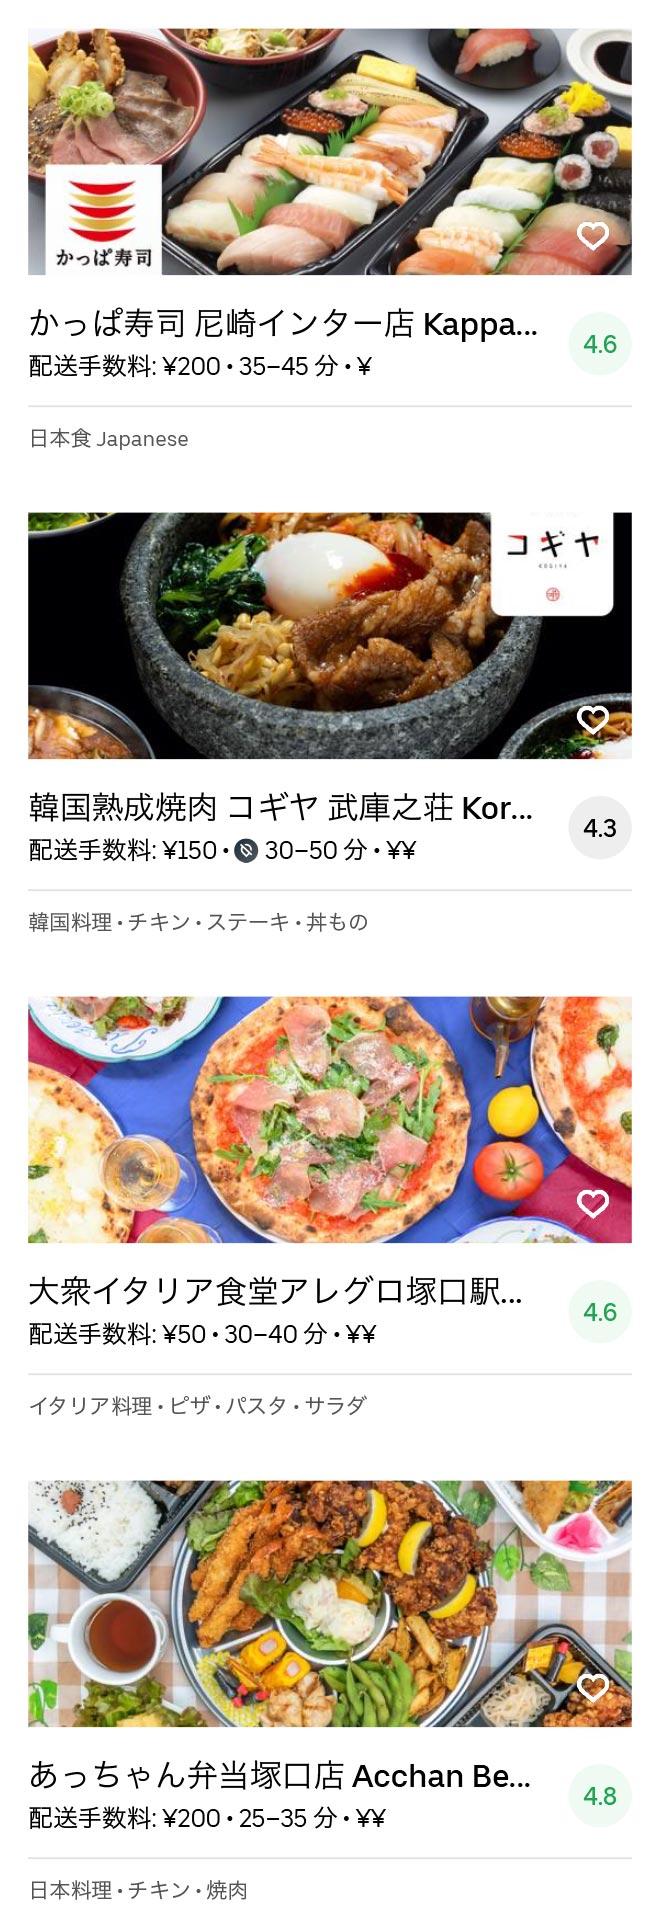 Amagasaki mukonosou menu 2005 07